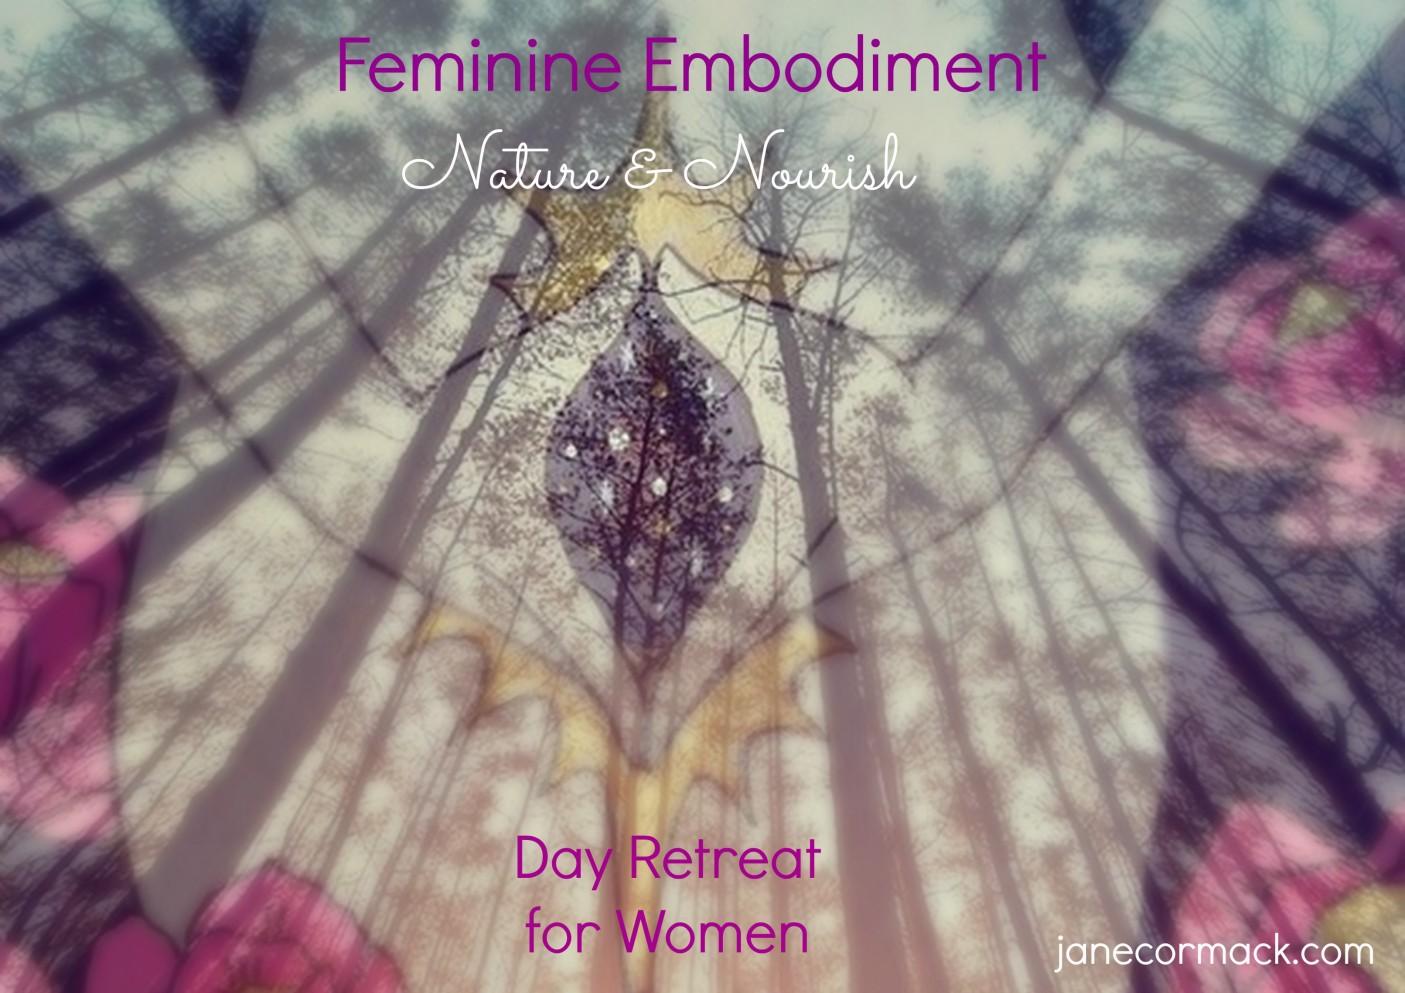 FeminineEmbodimentDayRetreat